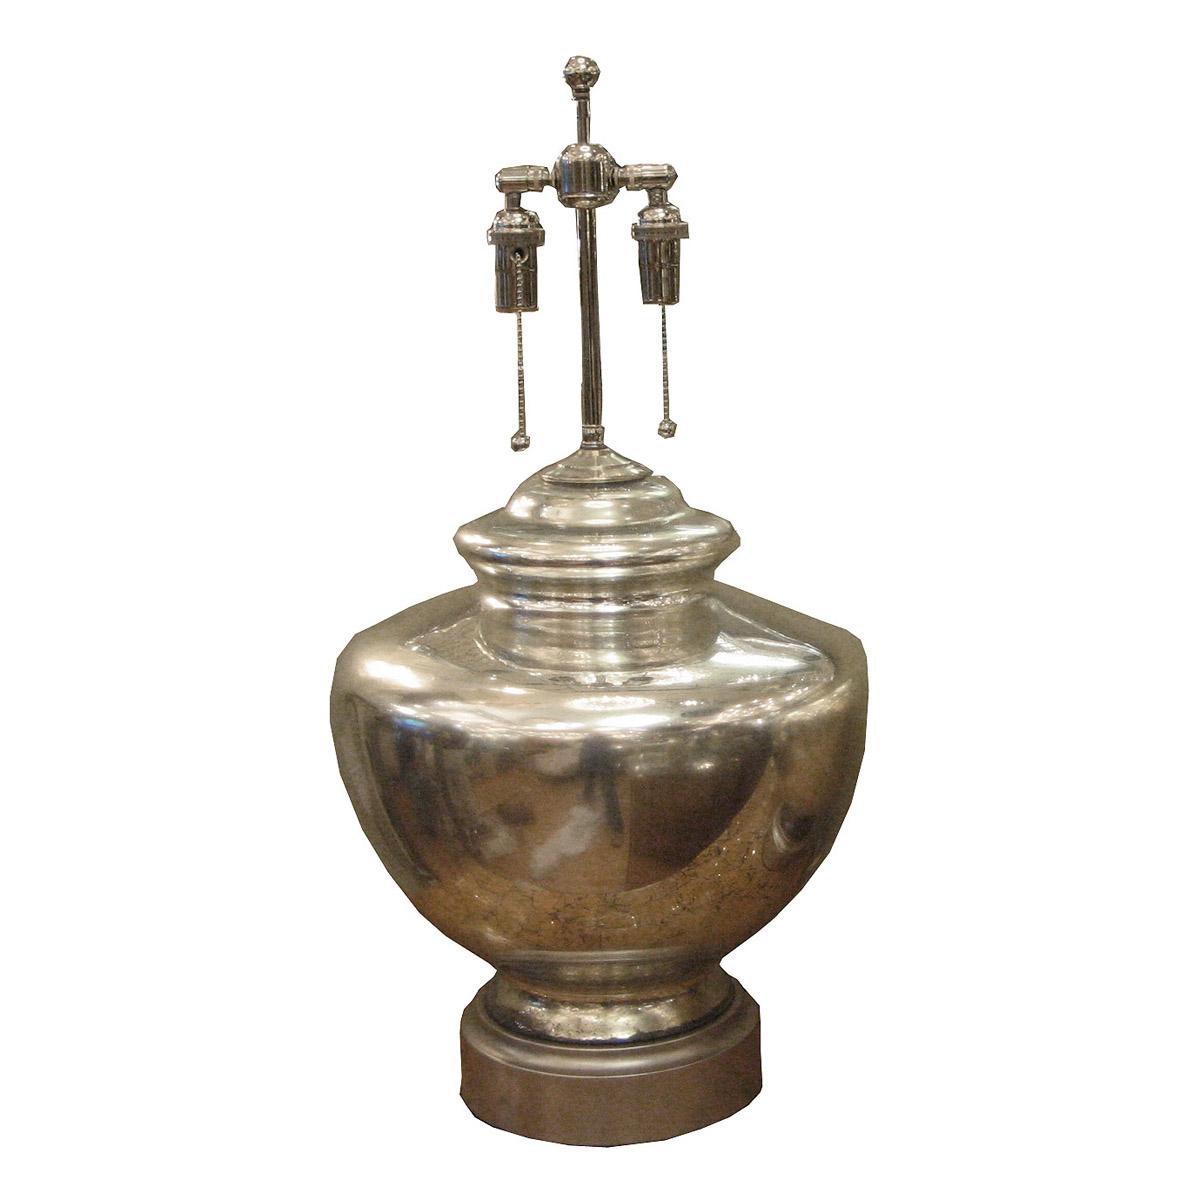 Single ginger jar form mercury glass table lamp.